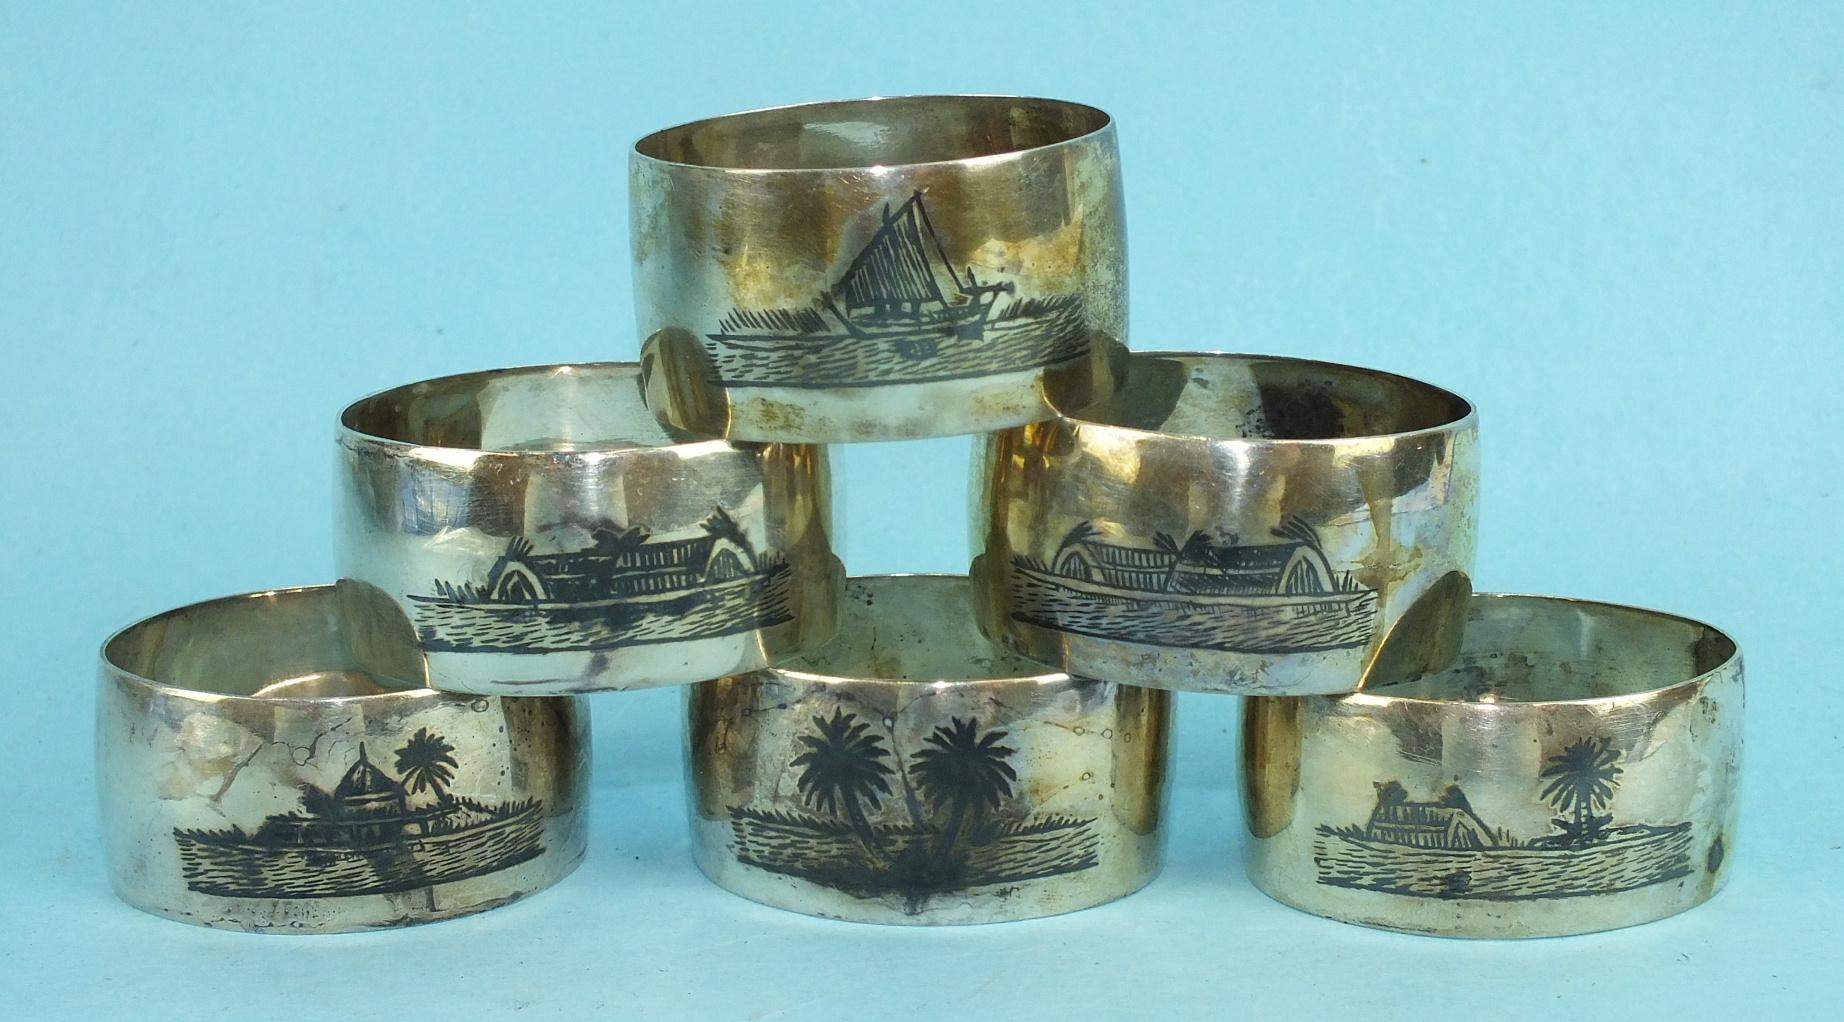 Lot 392 - A set of six Asian white metal napkin rings with niello-work decoration, ___3½oz.